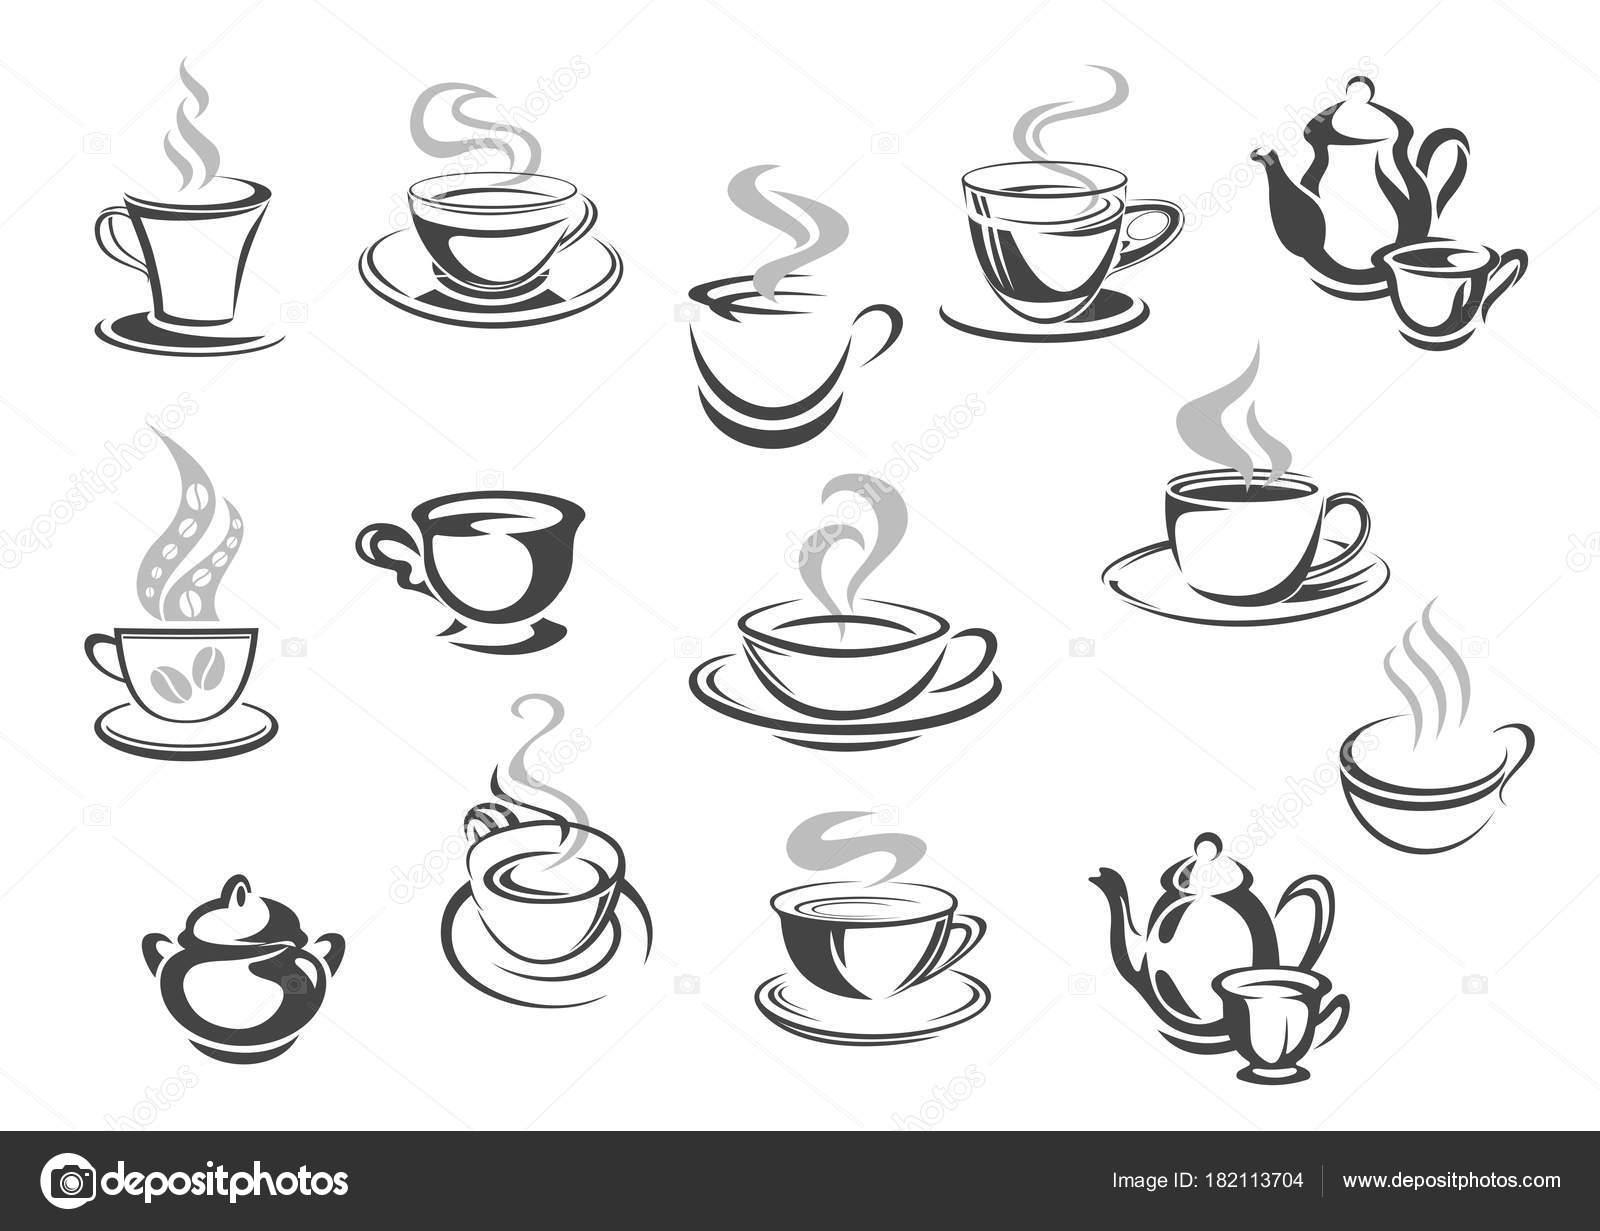 Imágenes Frappes Para Colorear Cafe Cafeteria Café Tazas